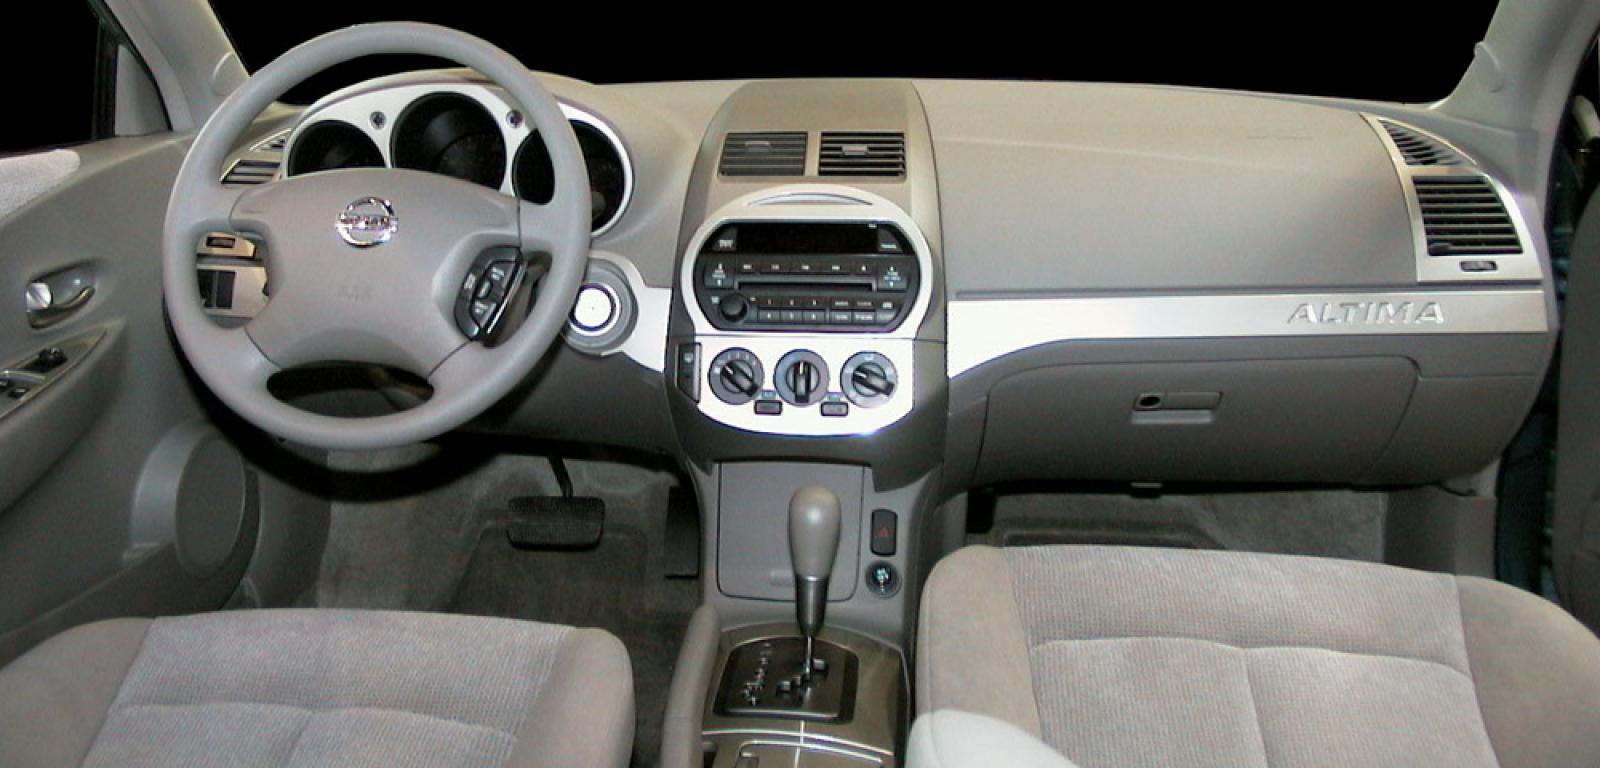 02 Nissan Altima